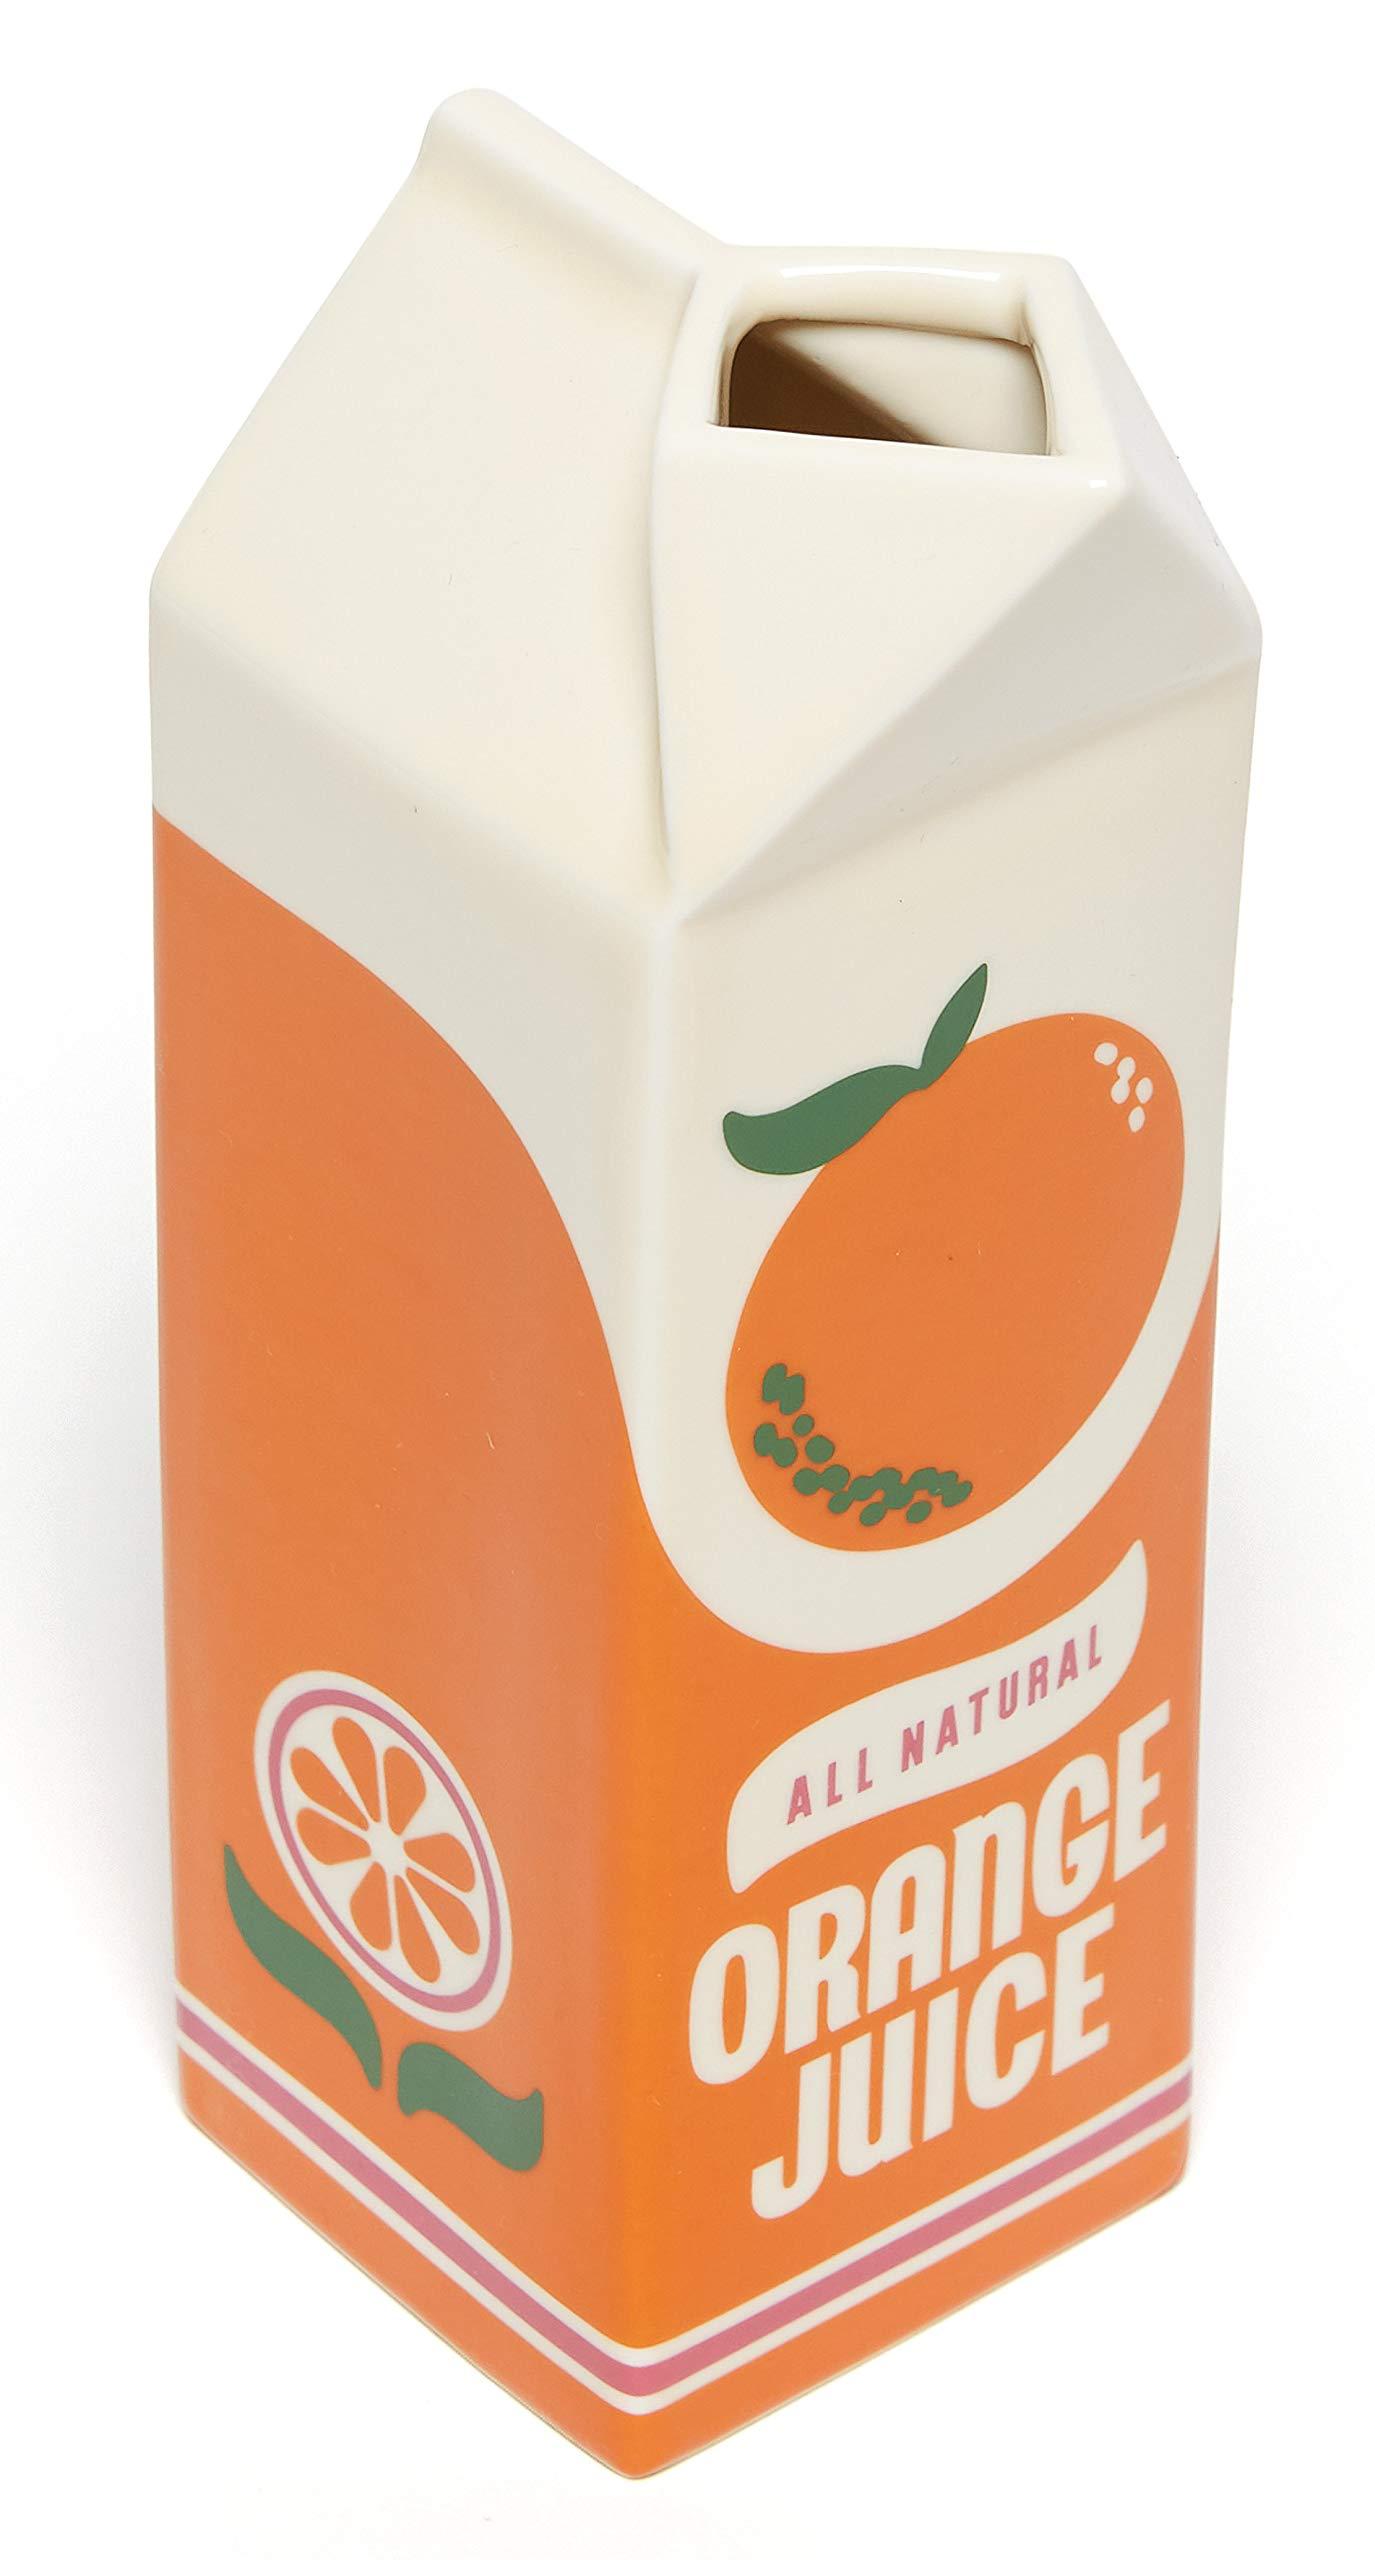 ban.do Vintage Inspired Rise and Shine Decorative Porcelain Vase, Orange Juice